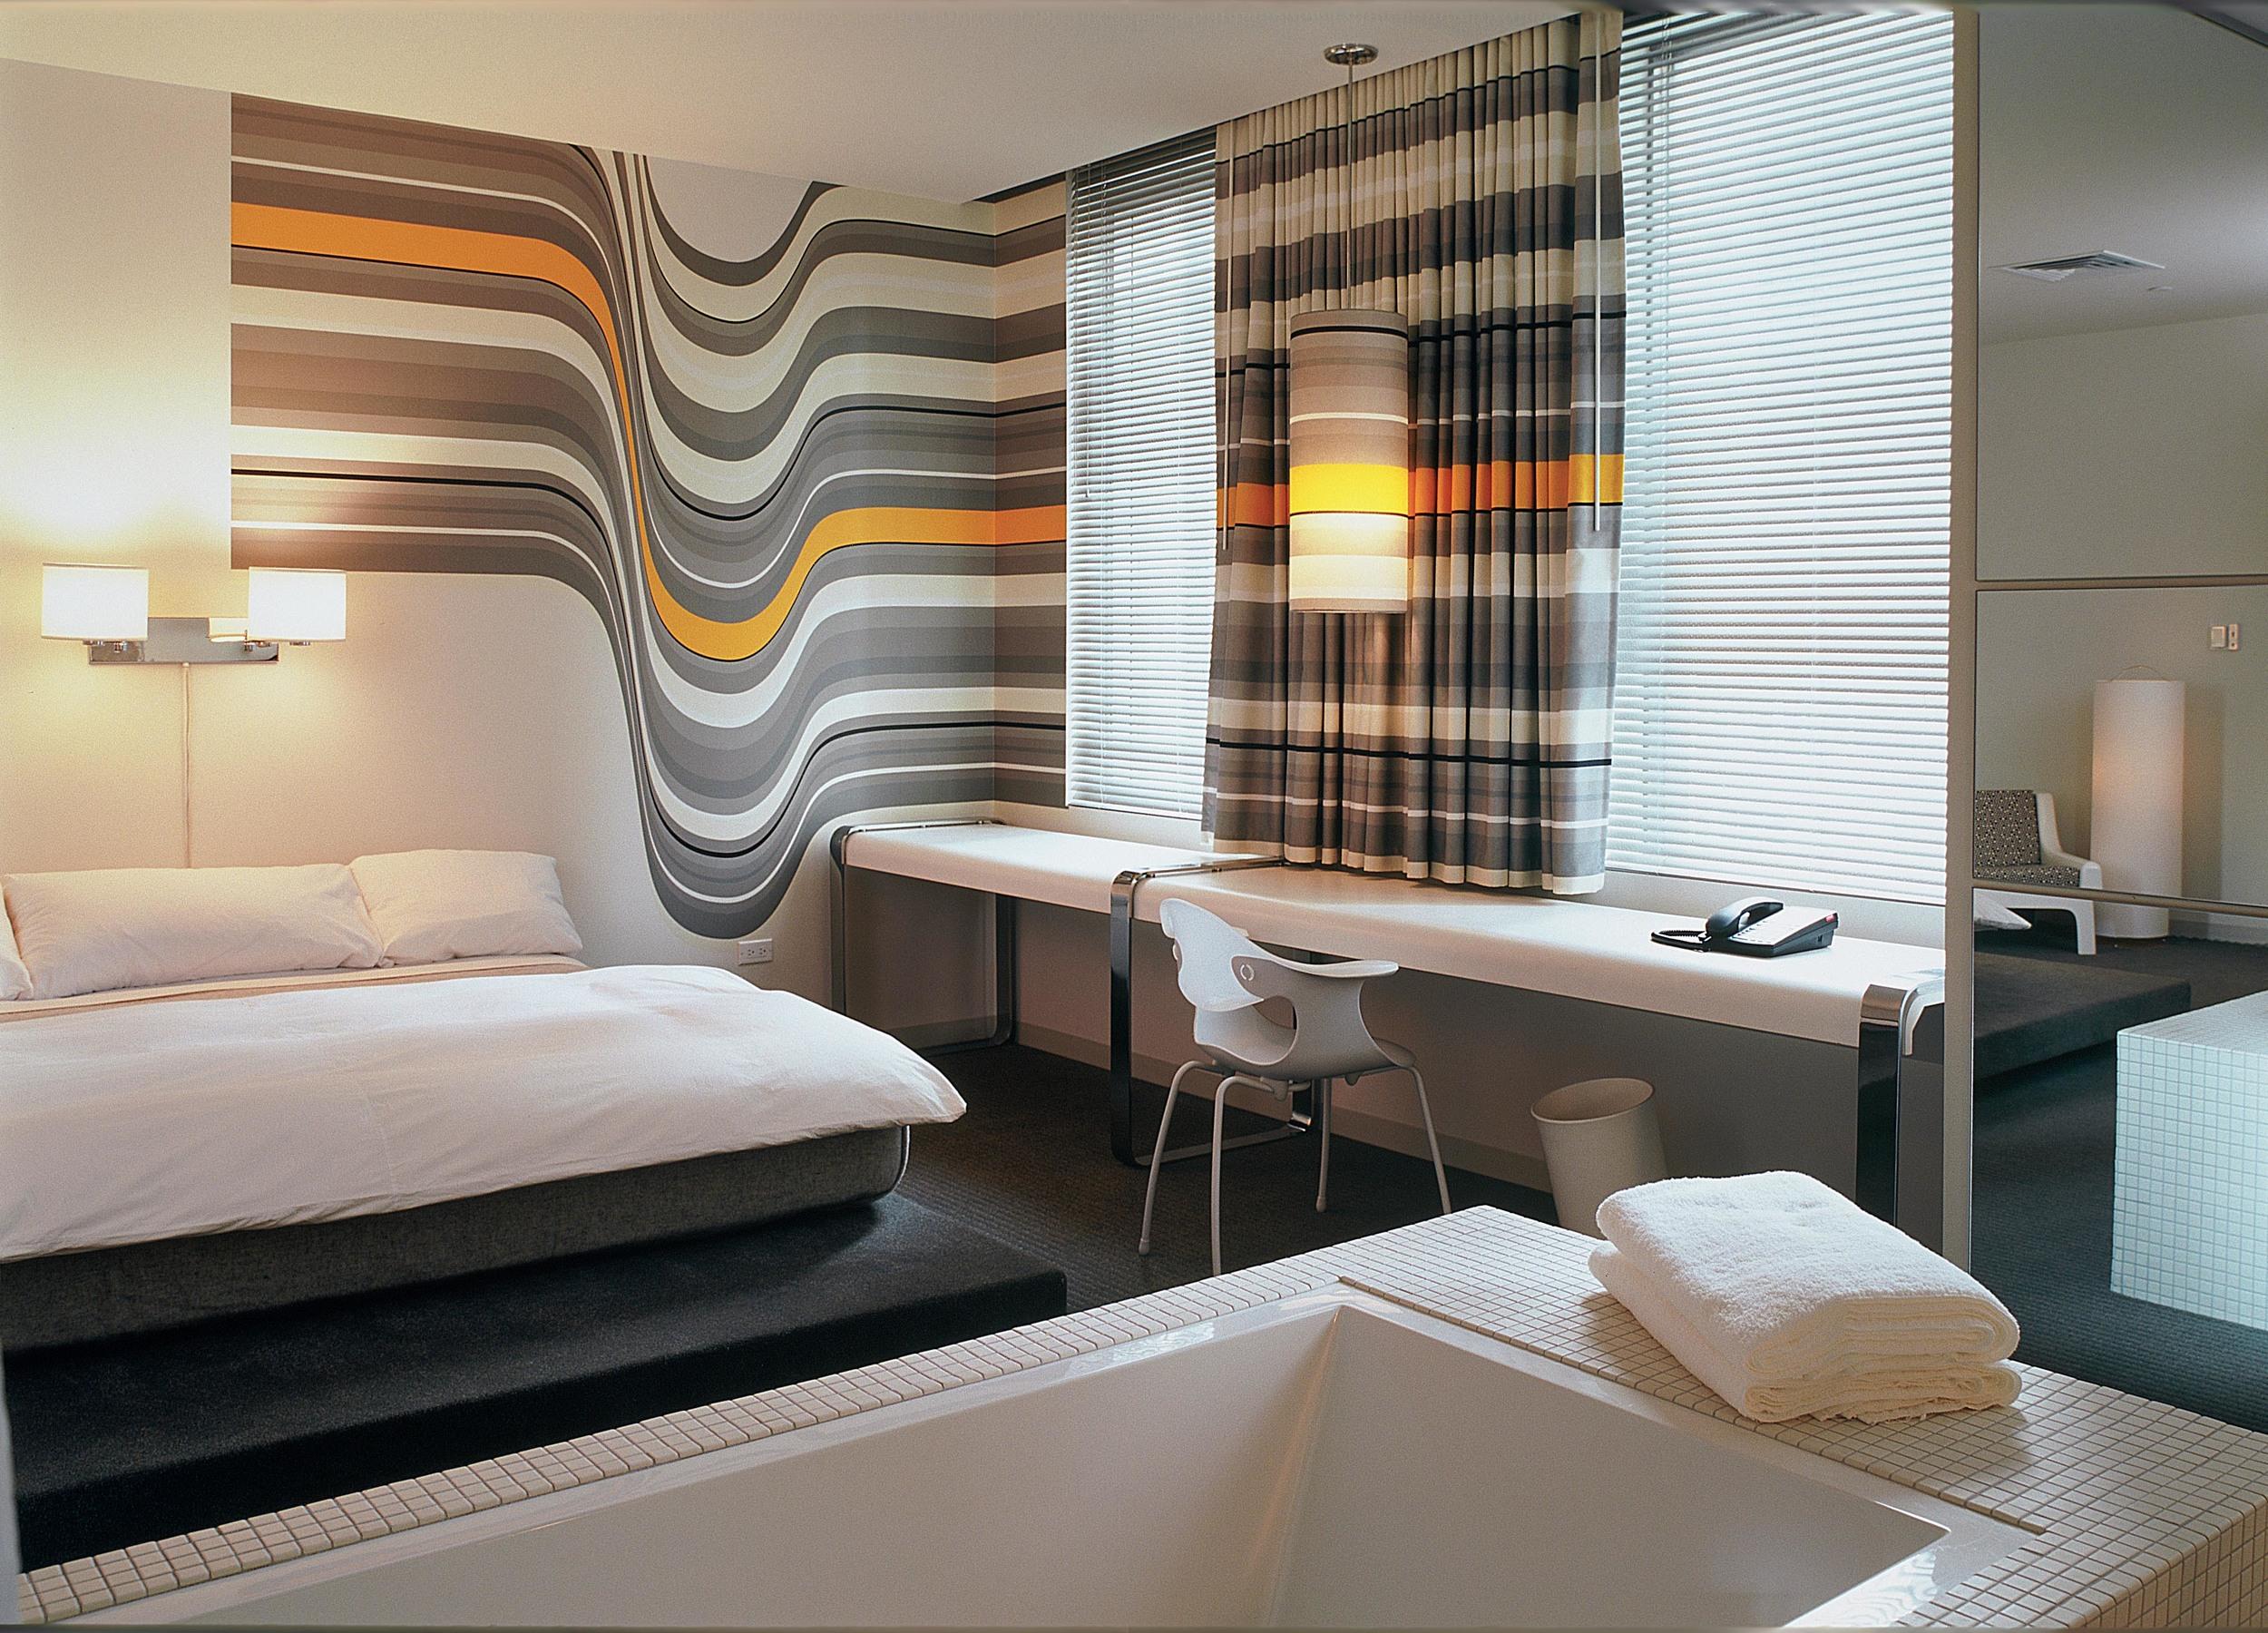 Standard DTLA_Room_602Huge_W_BathTub_Tim Street Porter.jpg